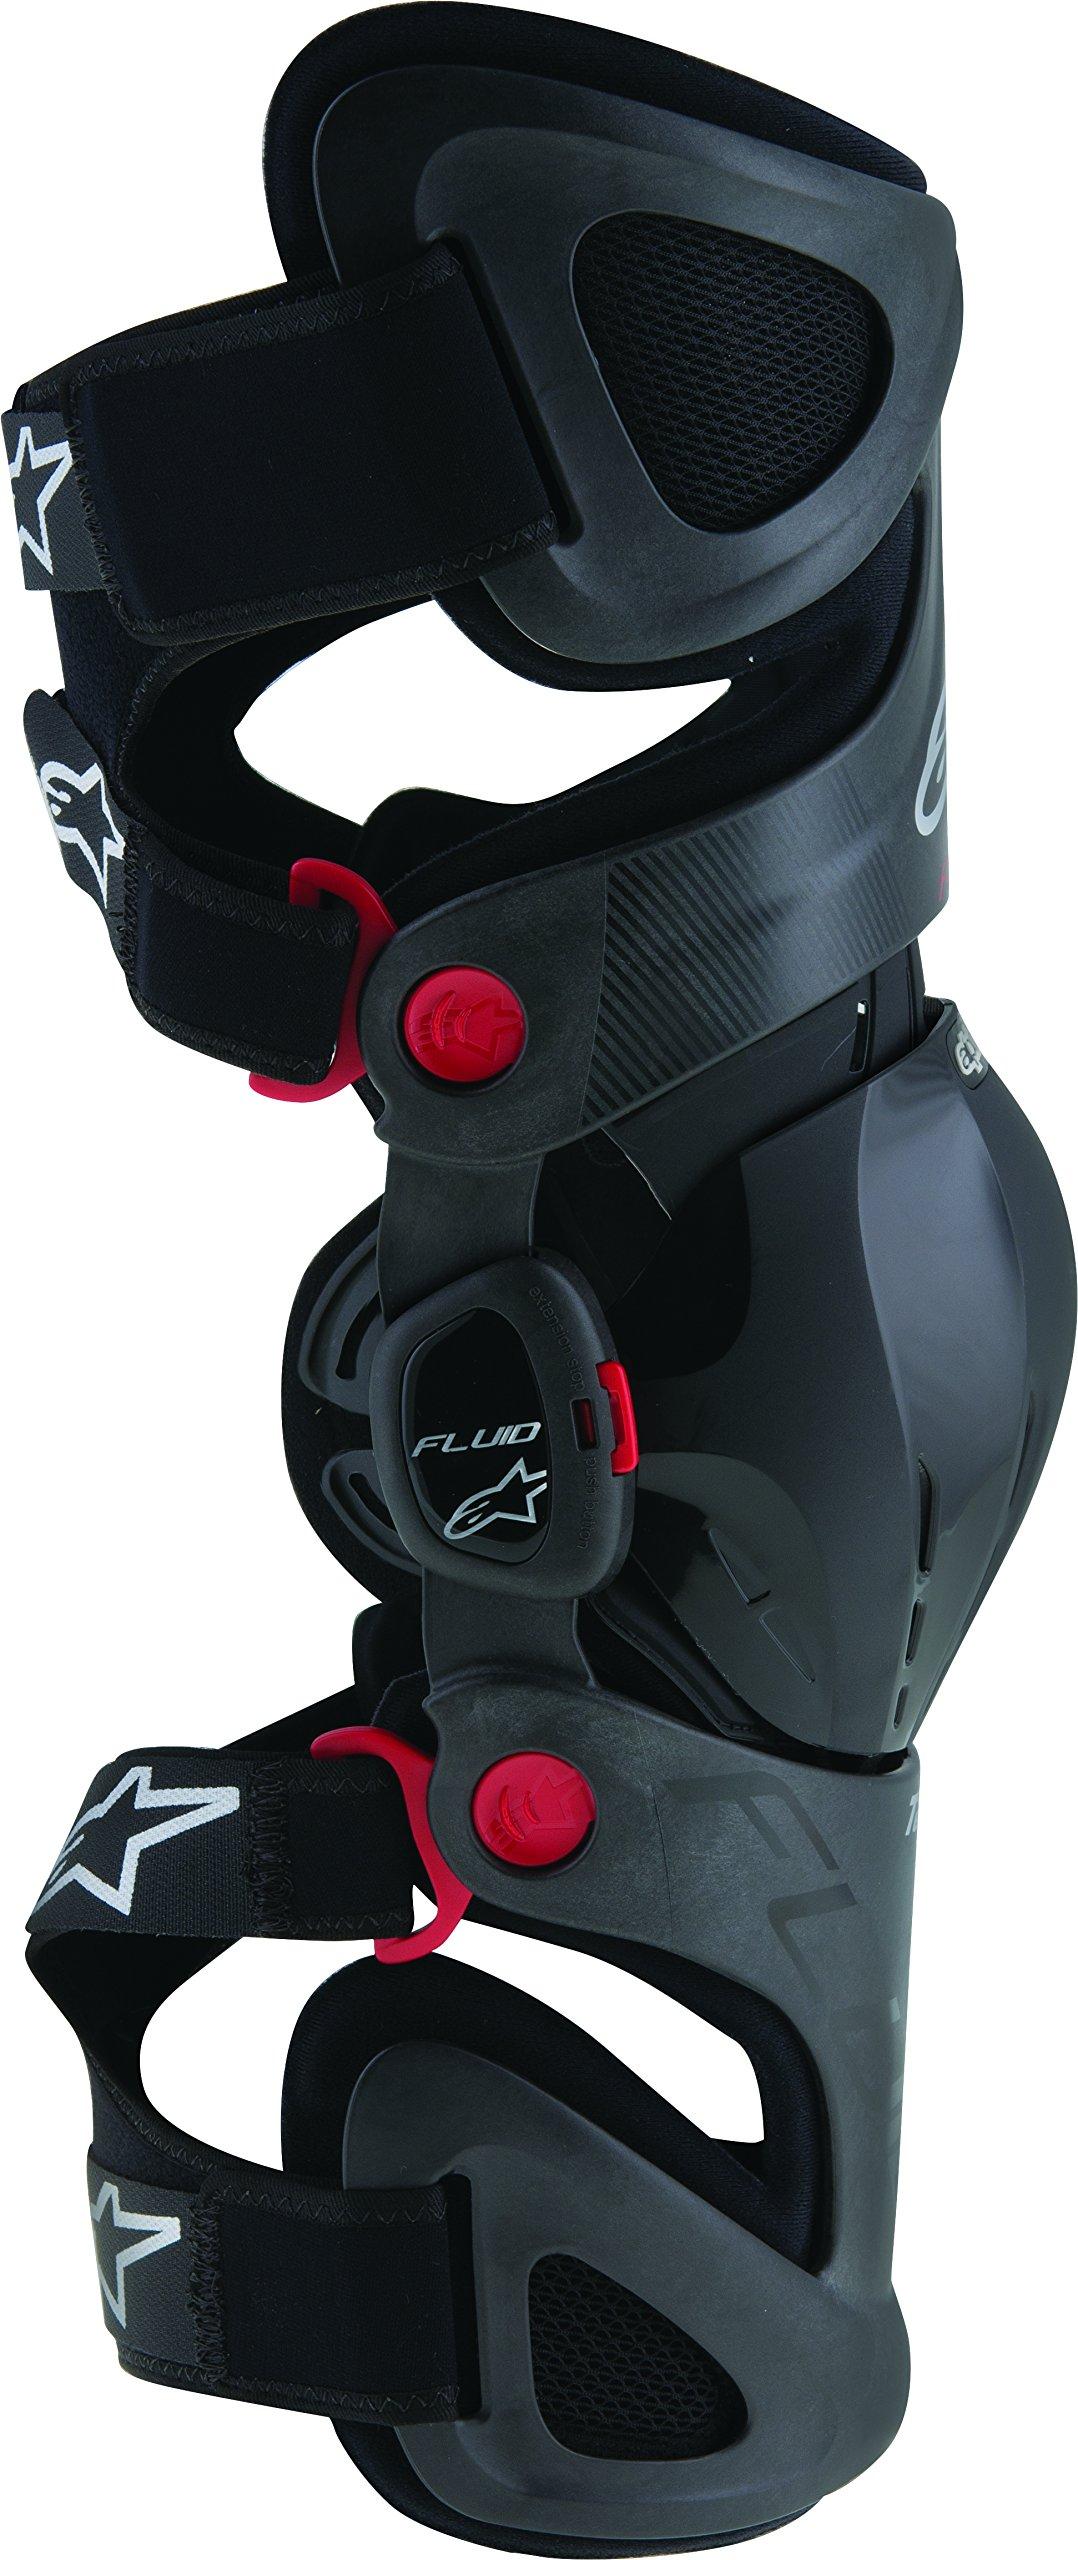 Alpinestars Unisex-Adult Fluid Tech Carbon Knee Brace Set Black/Red/White X-Large/XX-Large